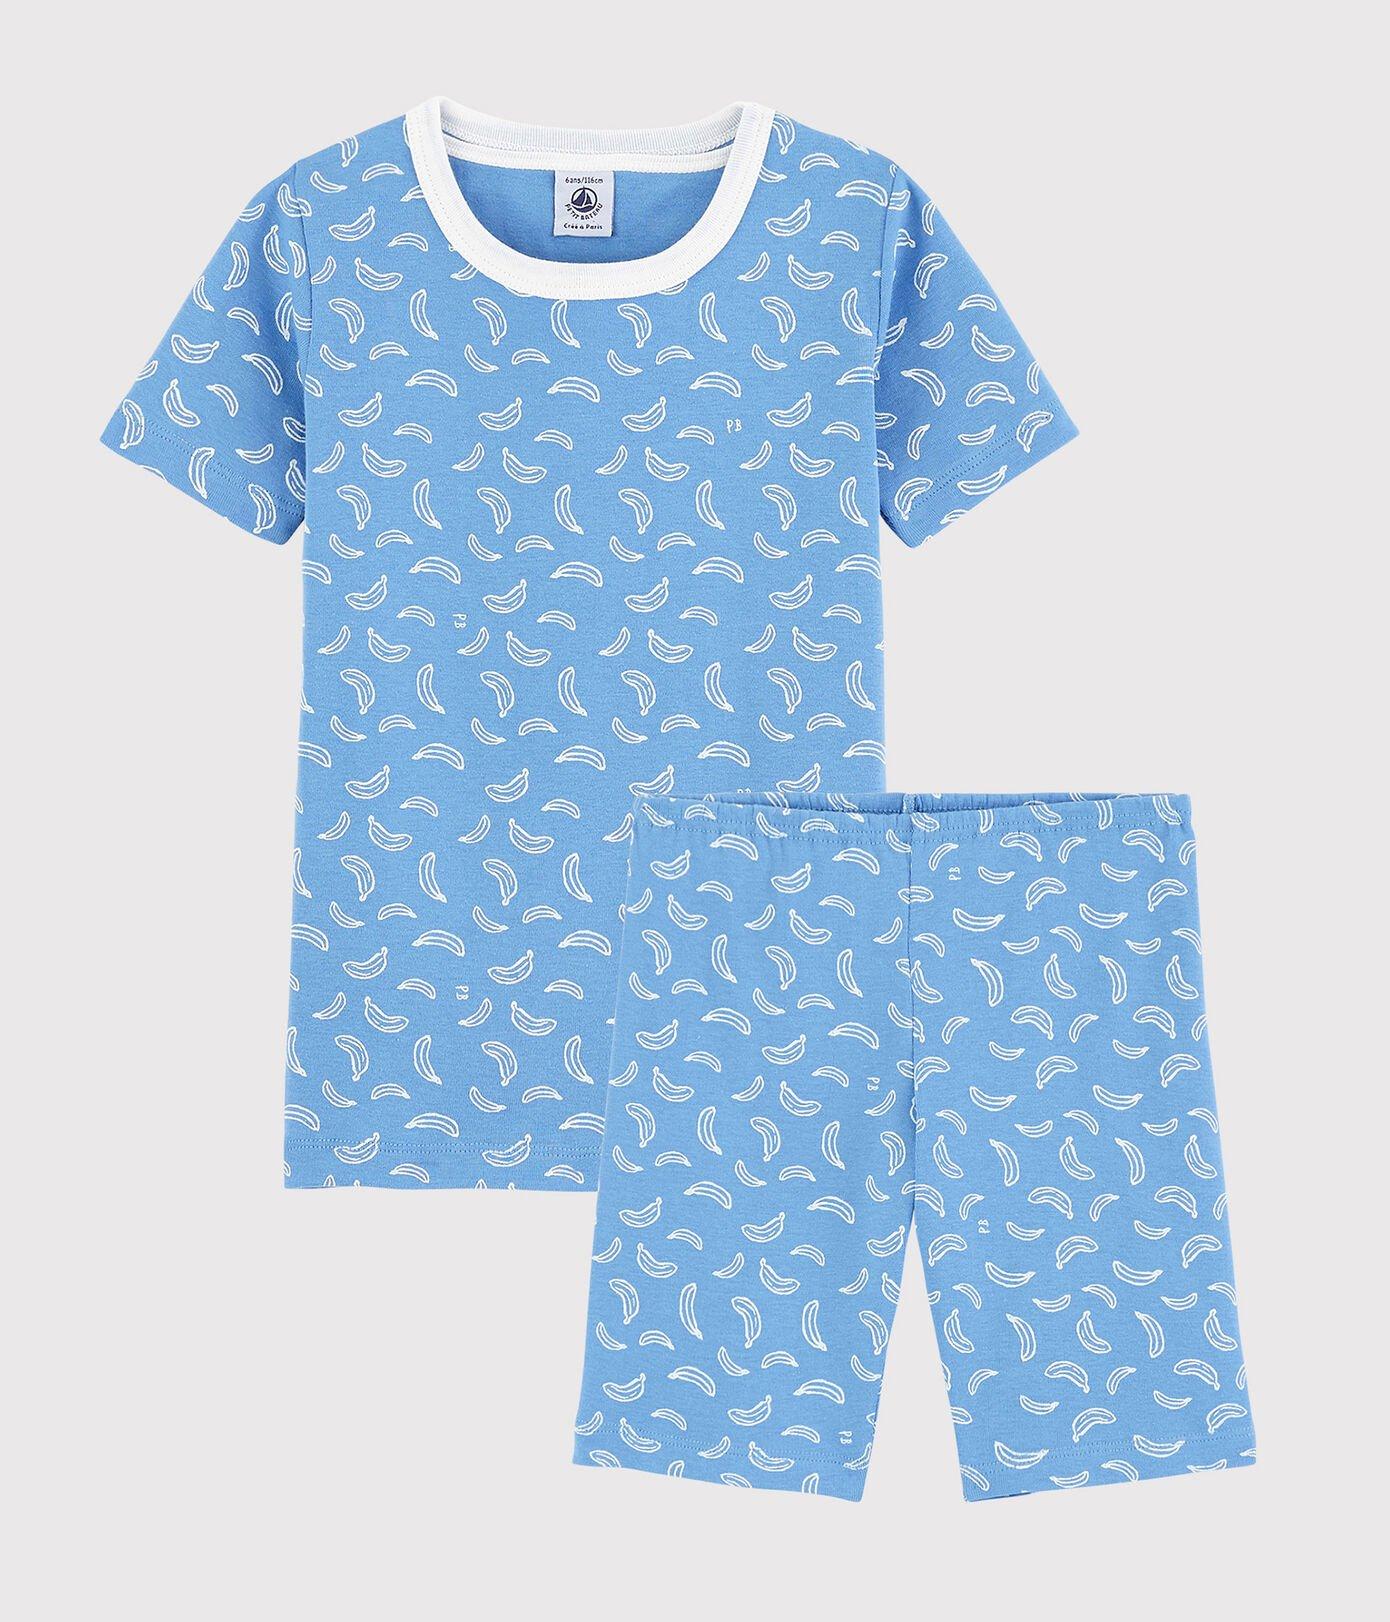 Petit Bateau T-Shirt + Short, Bananen